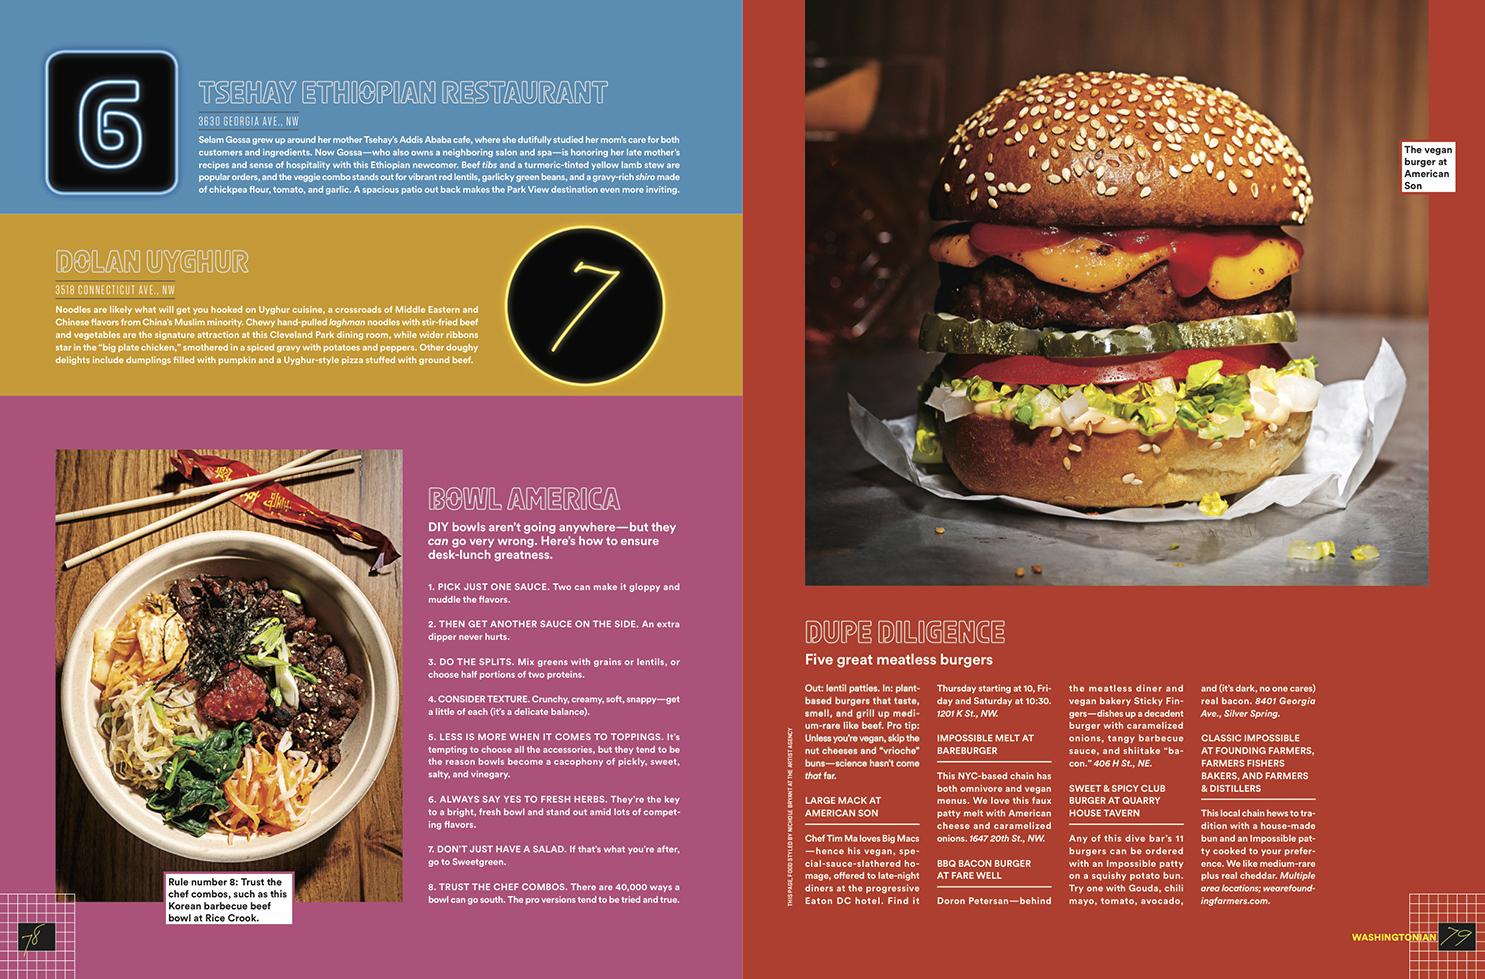 Phoode, Scott Suchman food photography, food magazine photography, Washingtonian Magazine food photography, commercial food photography, editorial food photography